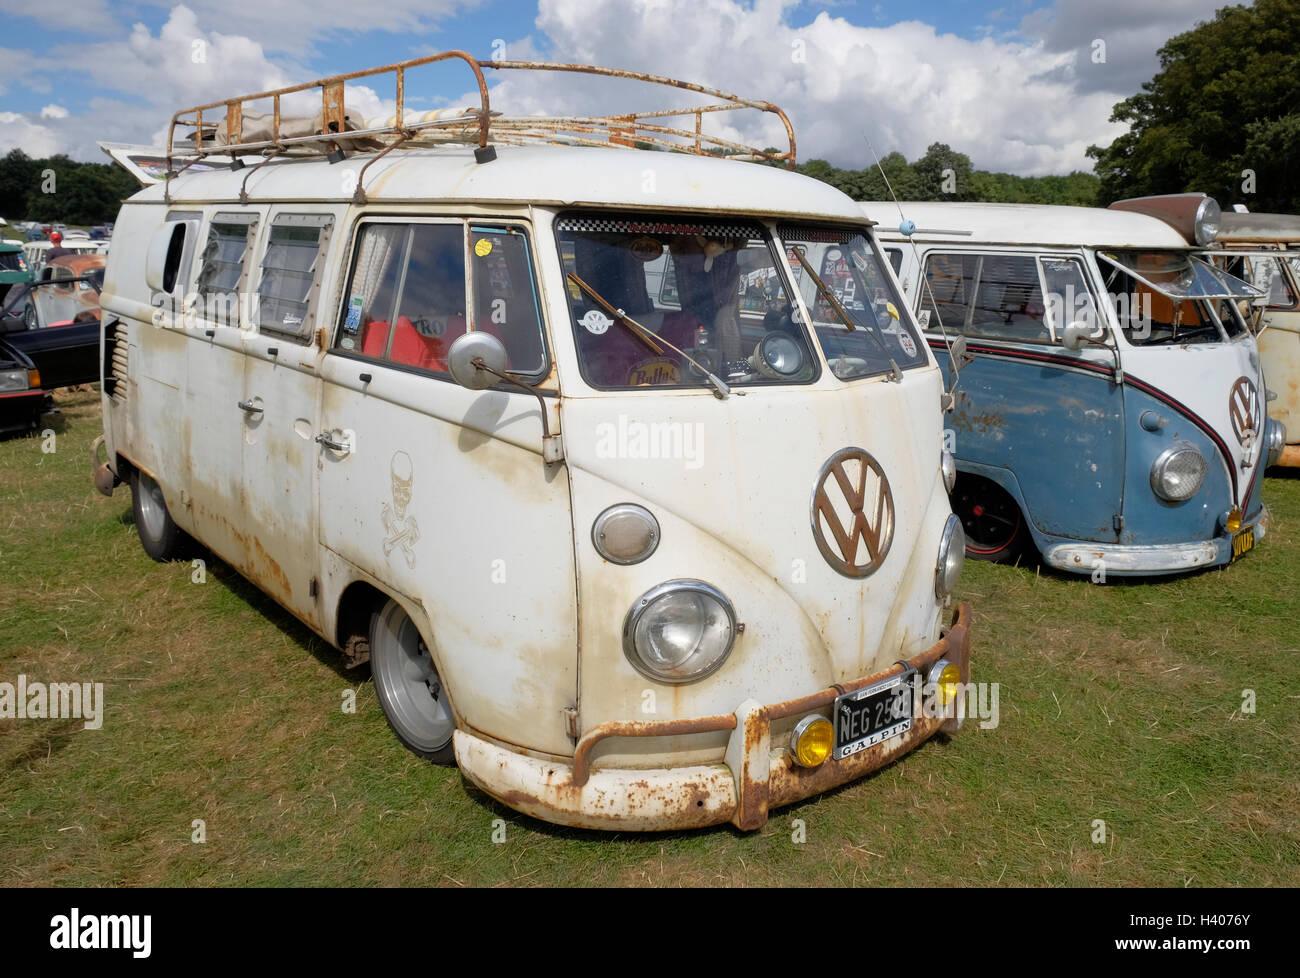 A 'rat look' lowered split-screen VW van at the Viva Skeg Vegas Classic VW Show, Revesby Park, Lincolnshire, - Stock Image